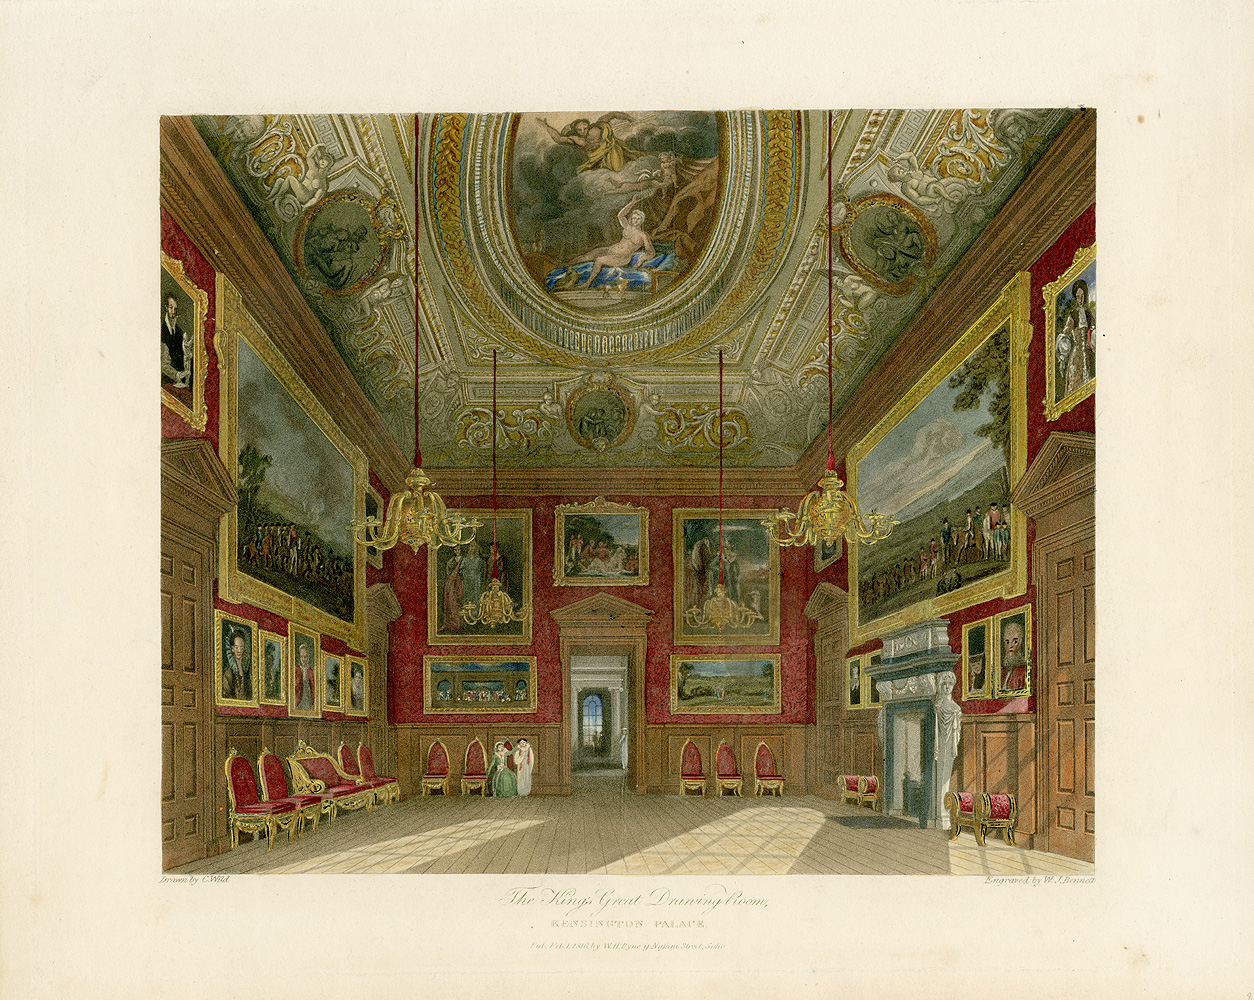 King S Great Drawing Room C Kensington Palace C From Pyne S Royal Residences C Panteek Pyn on Kensington Palace London